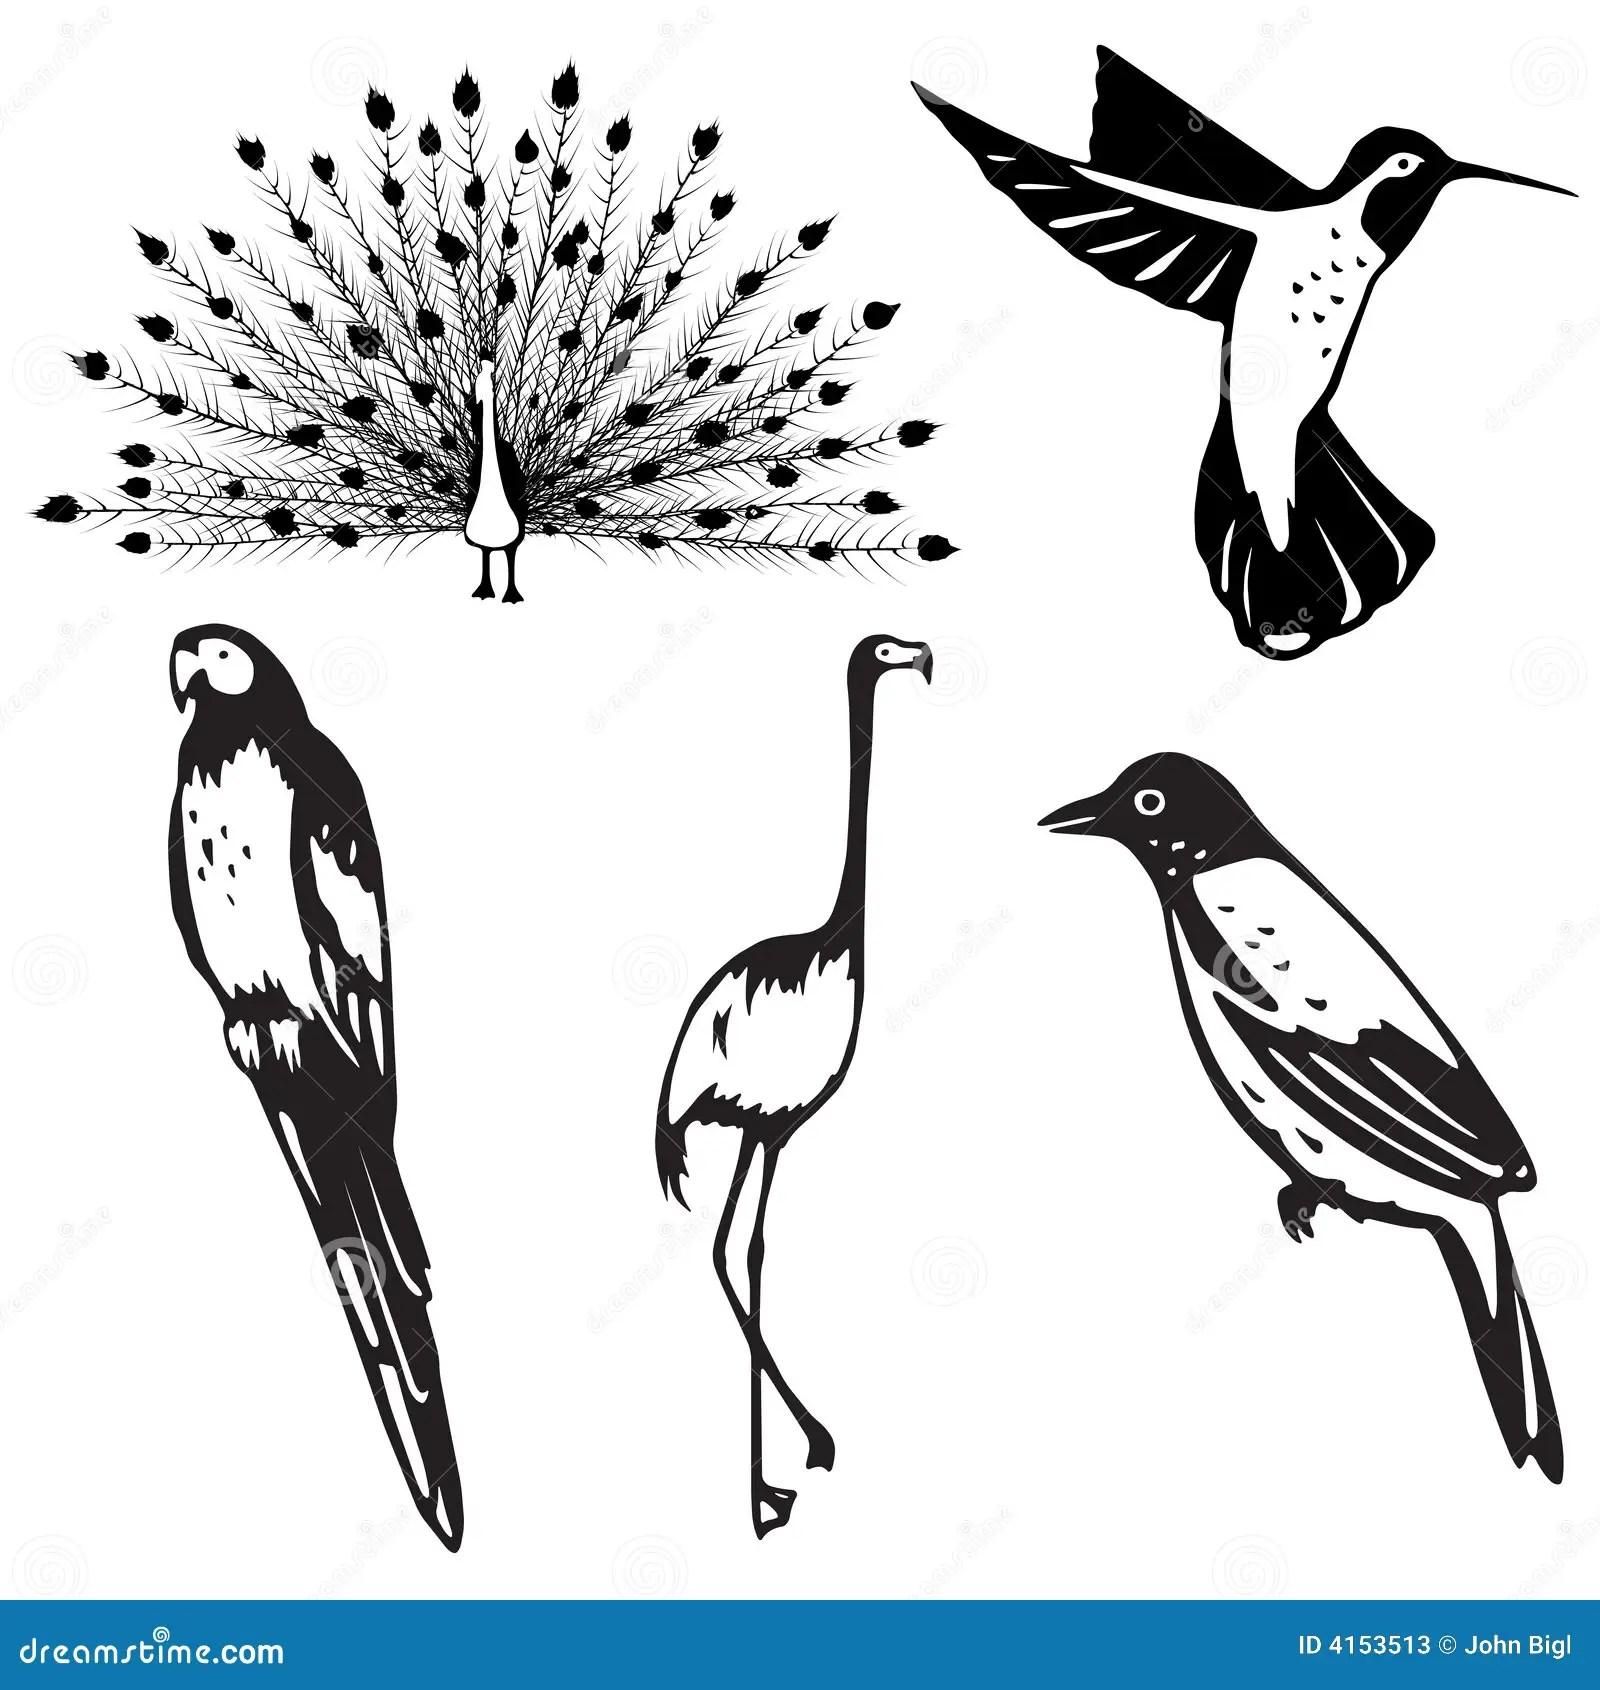 Cinco Ilustracoes Estilizados Do Passaro Ilustracao Do